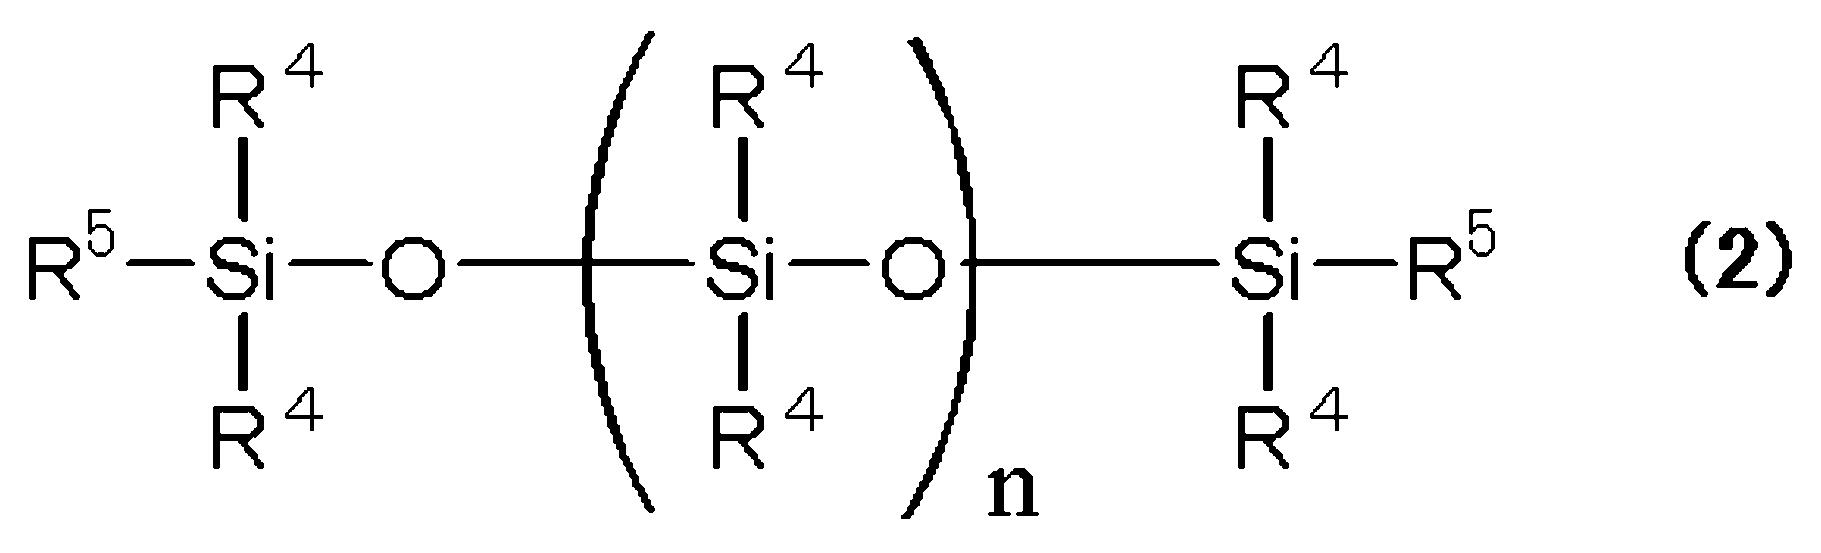 Figure 112013032283310-pat00005